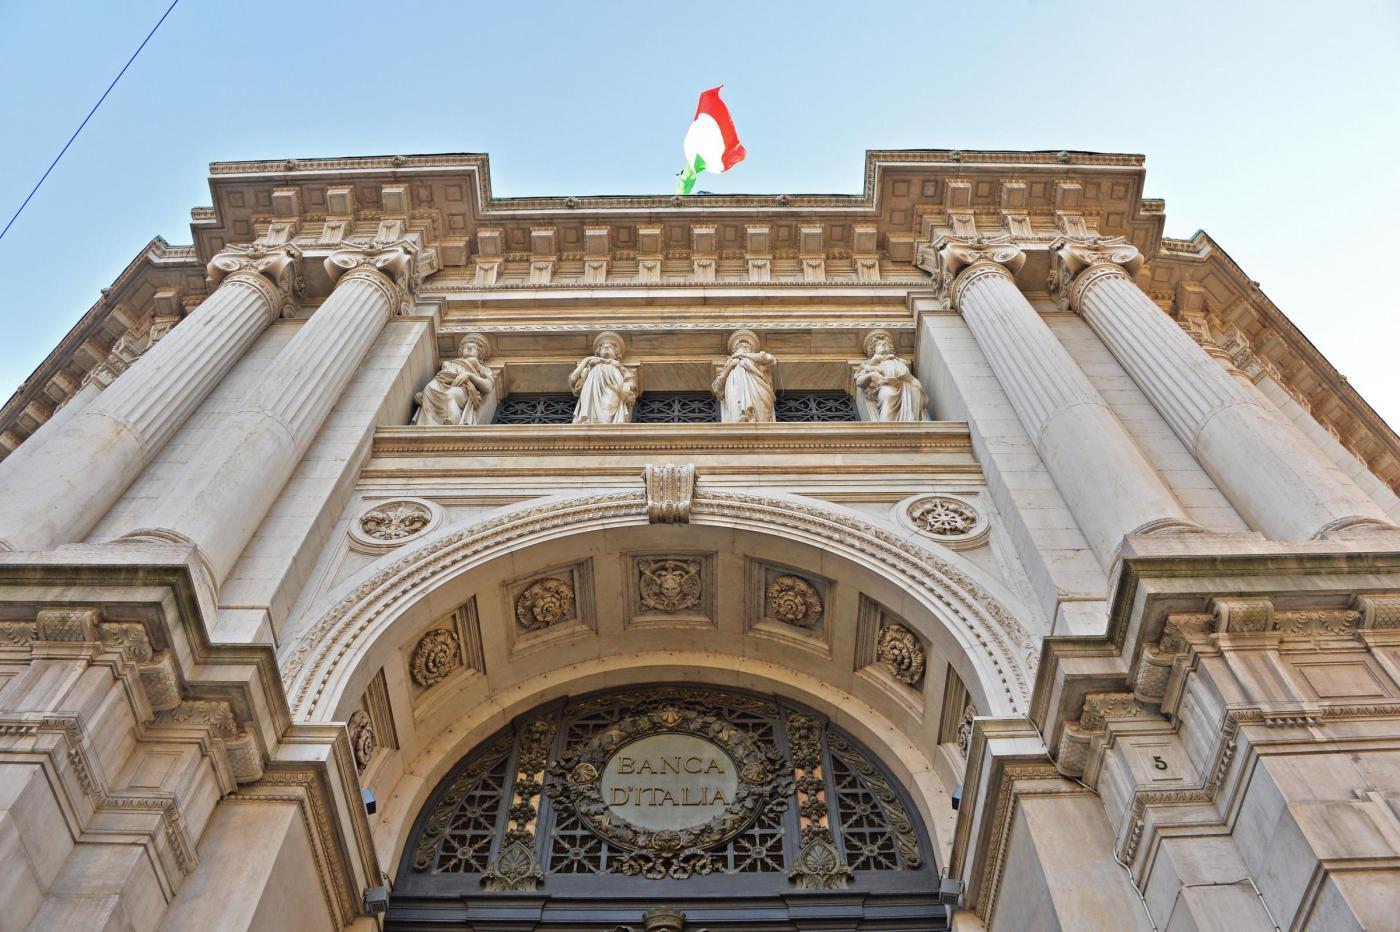 Palazzo banca d'Italia, milano